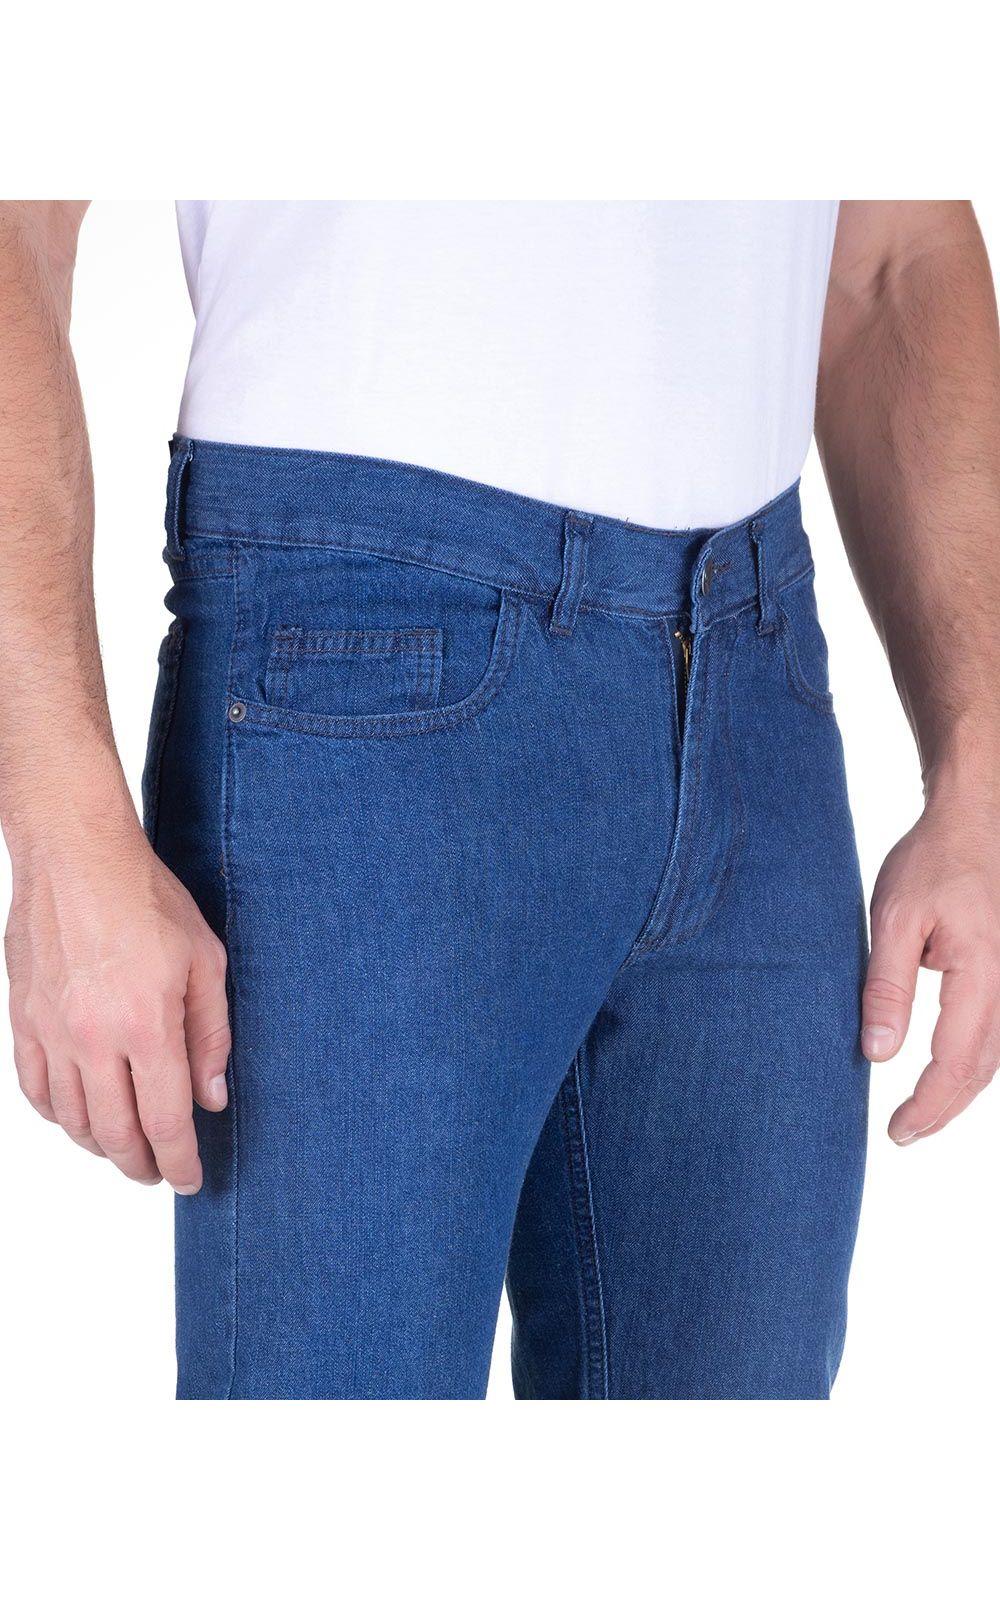 Foto 3 - Calça Jeans Masculina Azul Claro Lisa